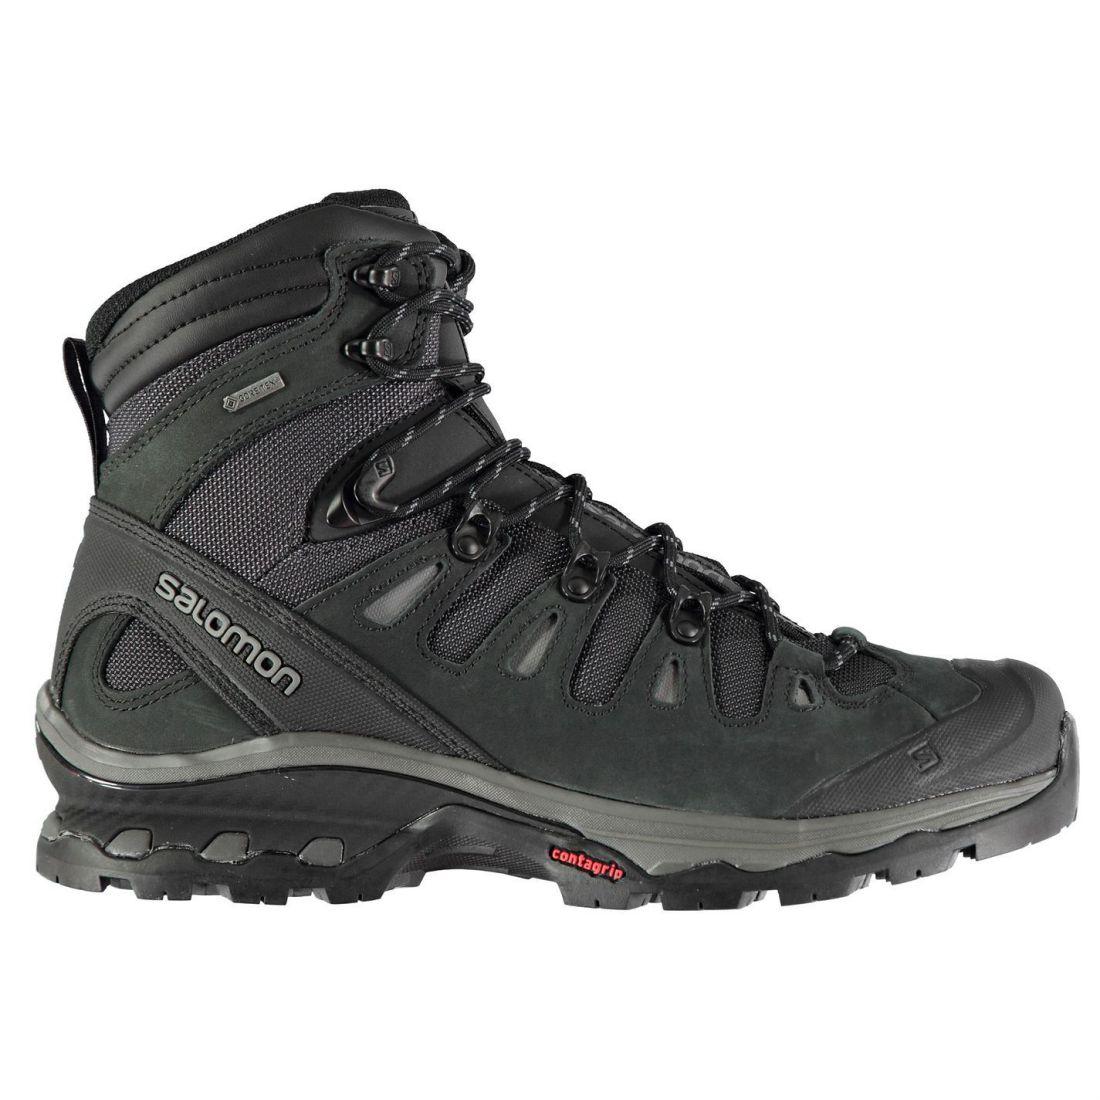 Salomon Quest 4D 3 GTX Caminar botas Para Hombres Caballeros Cordones atados Ventilado De Agua